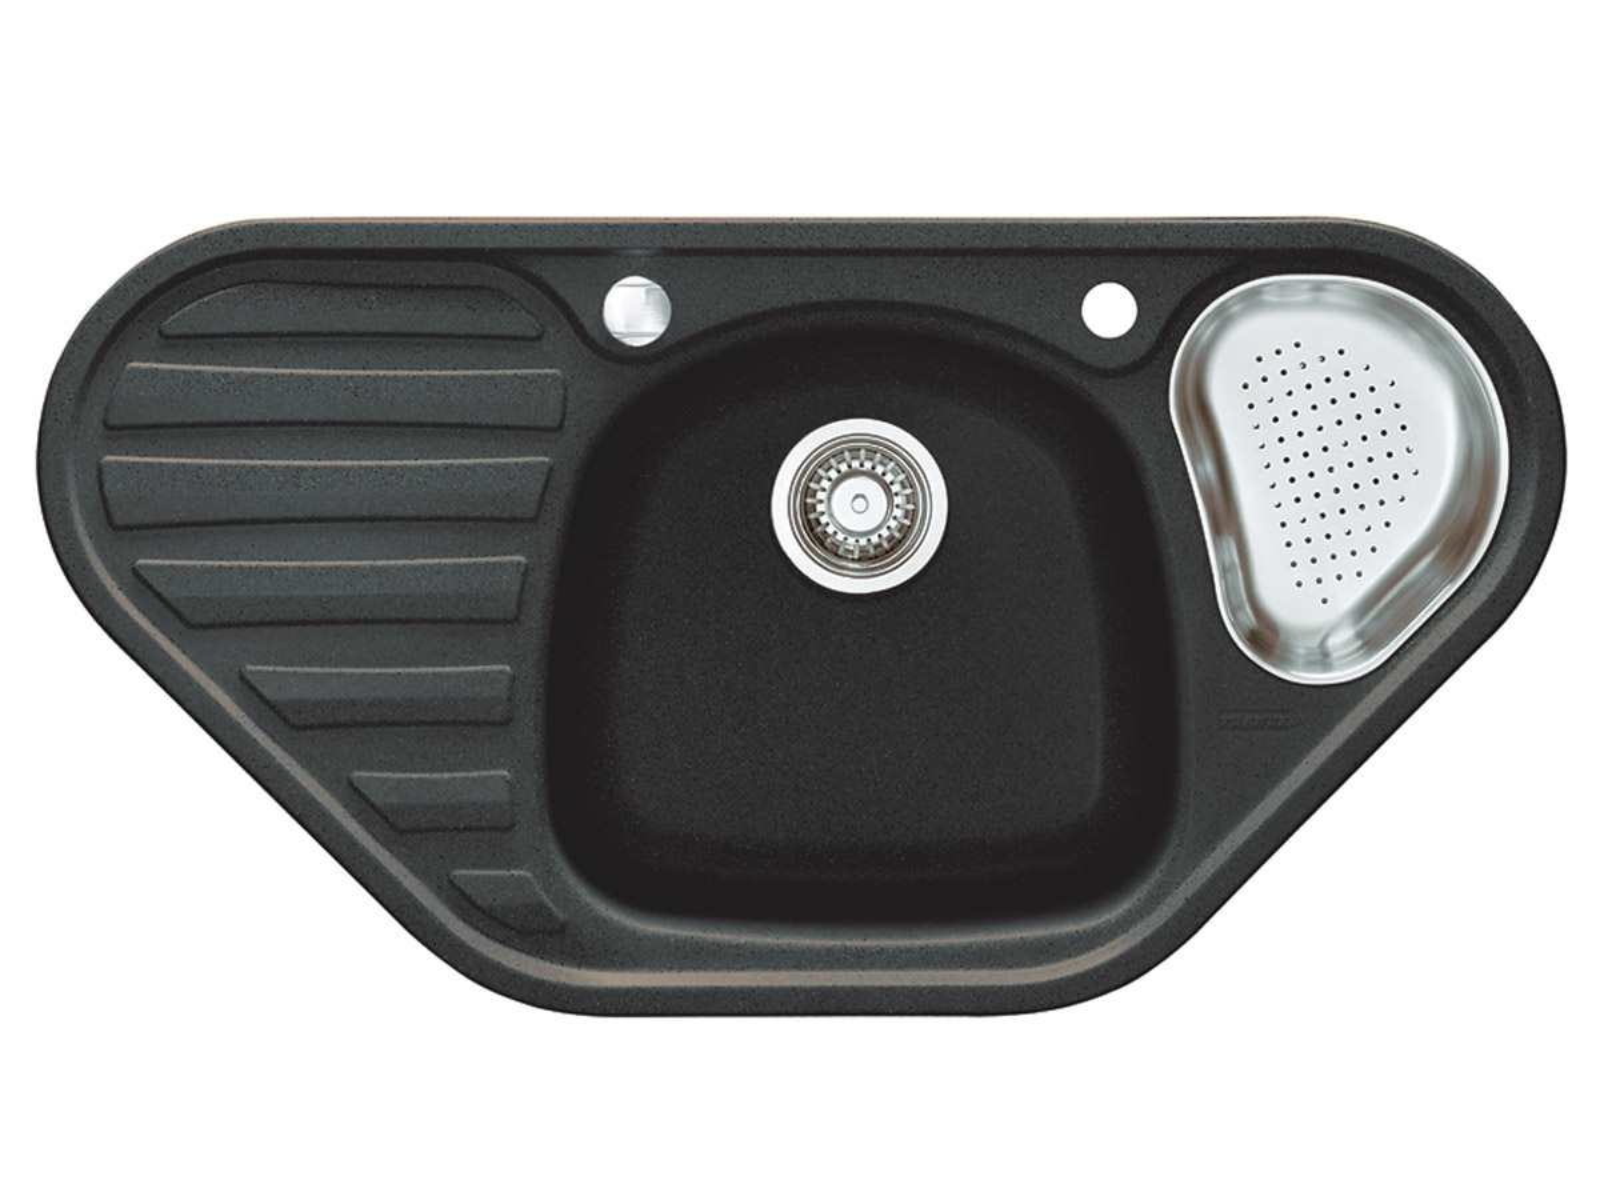 Franke Calypso COG 651-E Graphit Granitspüle